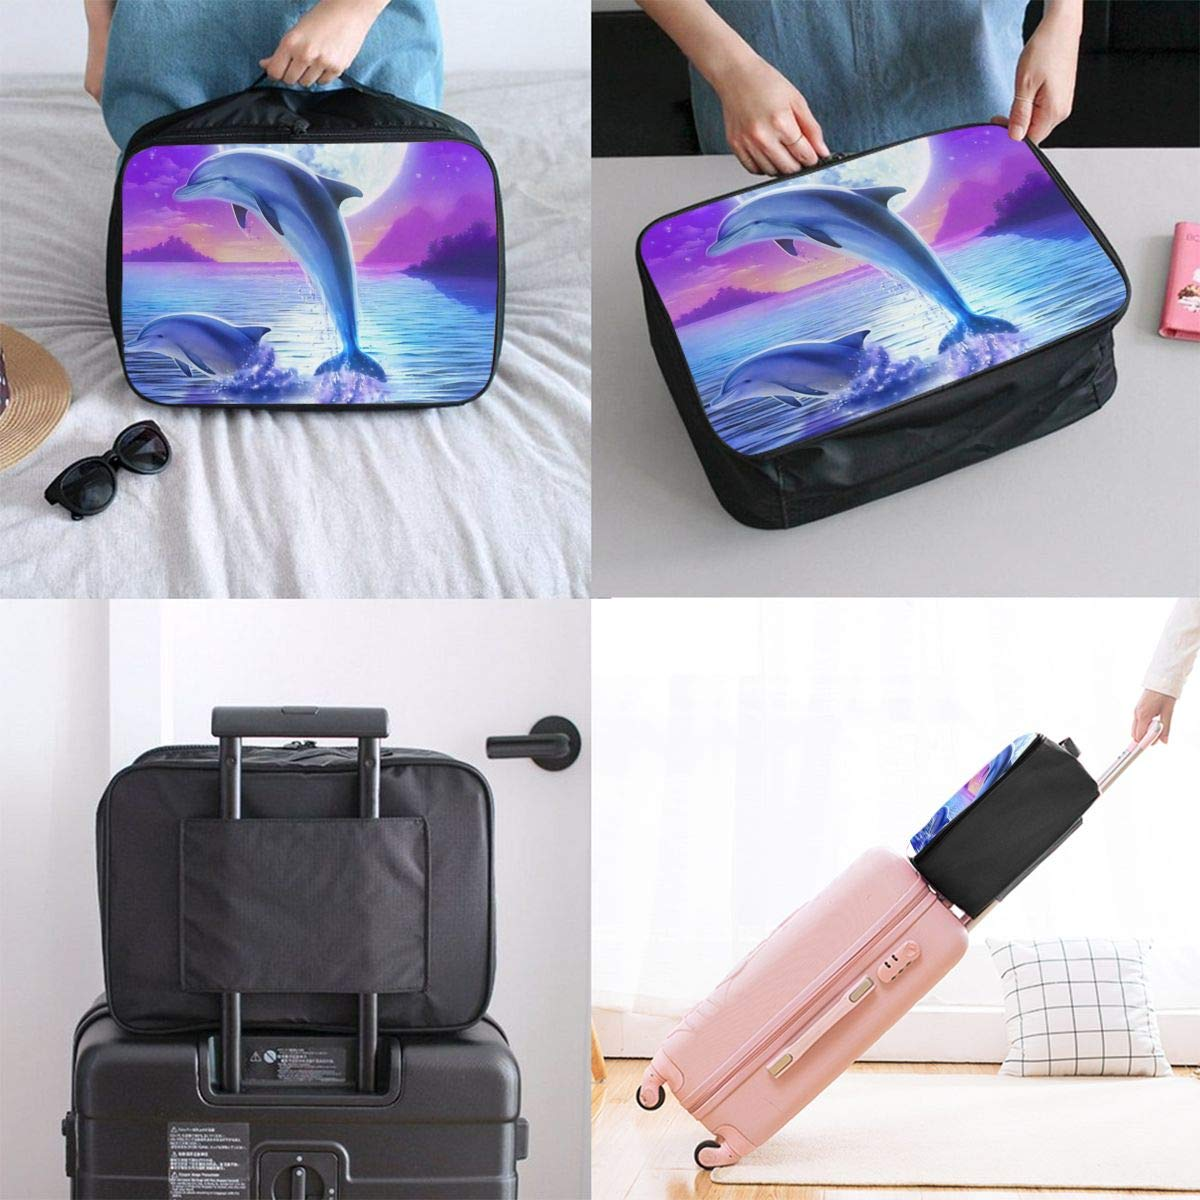 Dolphin Travel Duffel Bag Waterproof Fashion Unisex Lightweight Large Capacity Portable Luggage Bag for Women Men